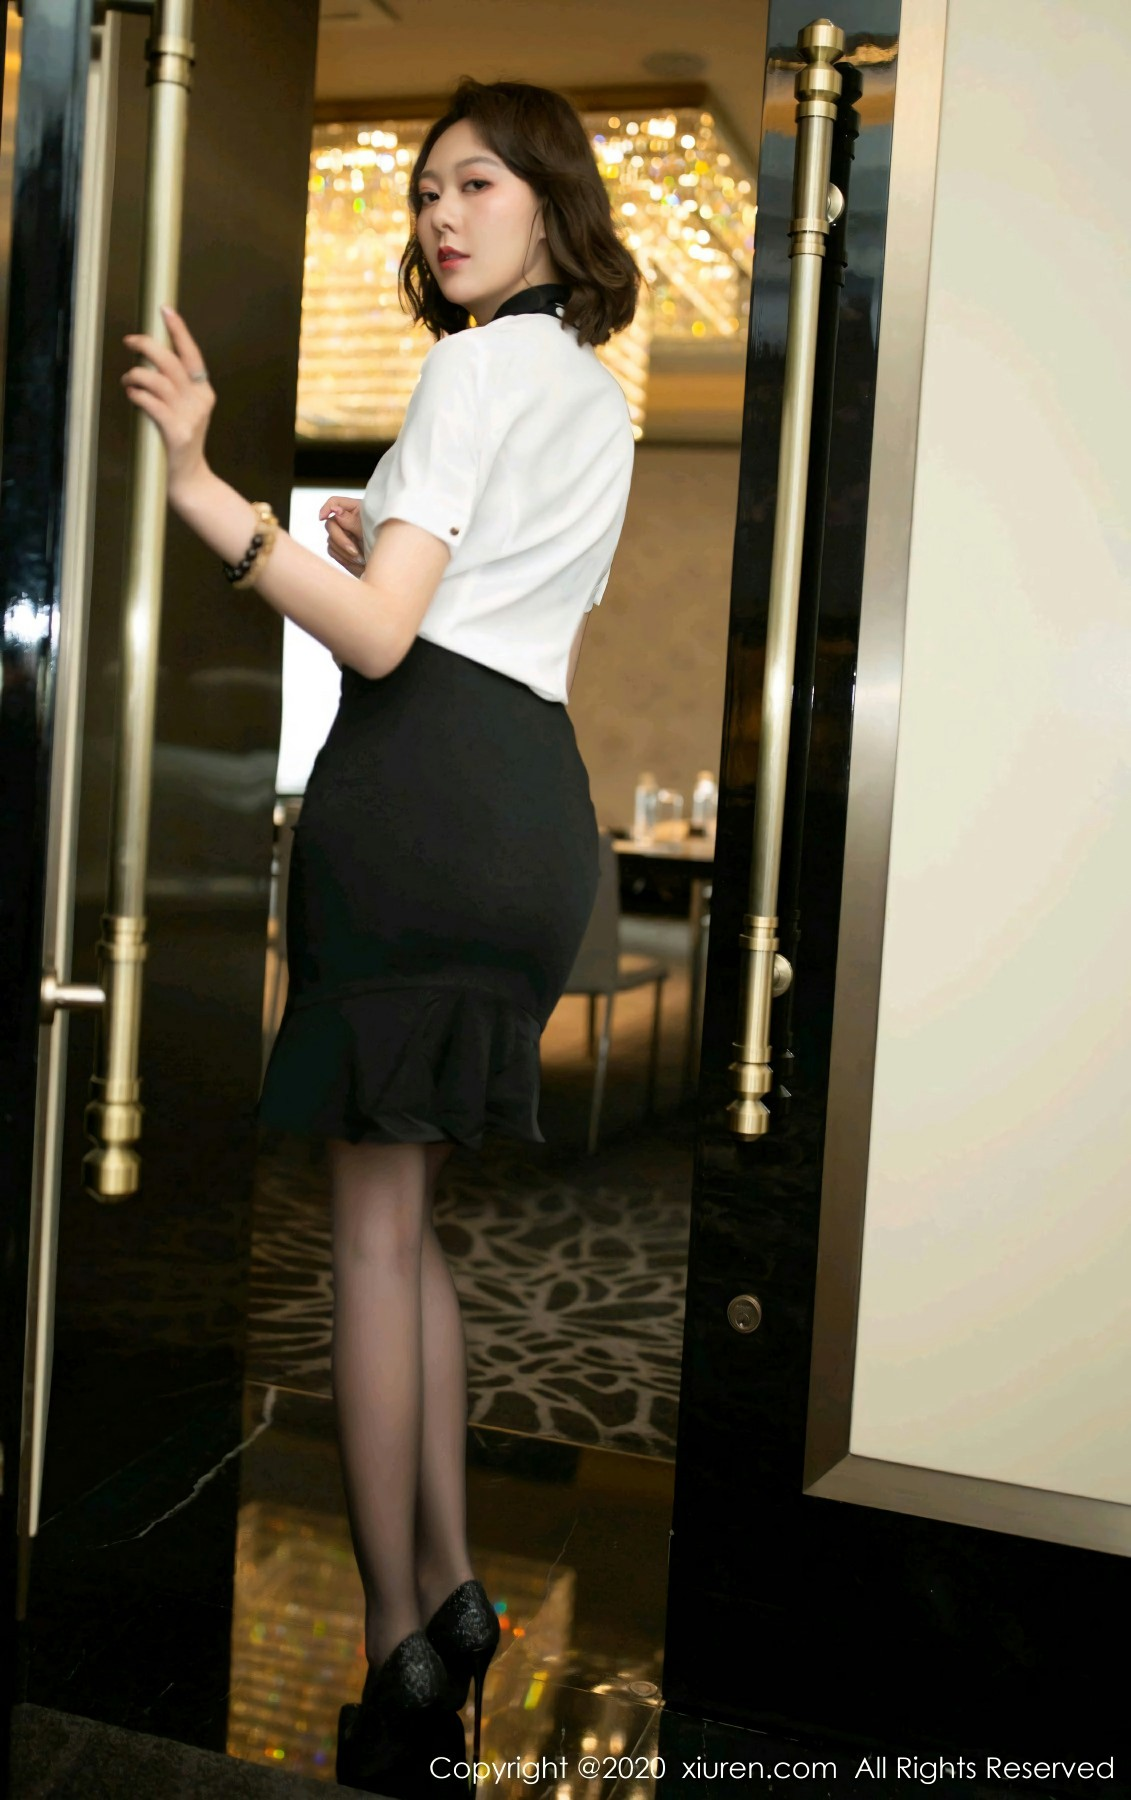 [XiuRen秀人网] 2020.08.10 No.2422 艺轩 第2张